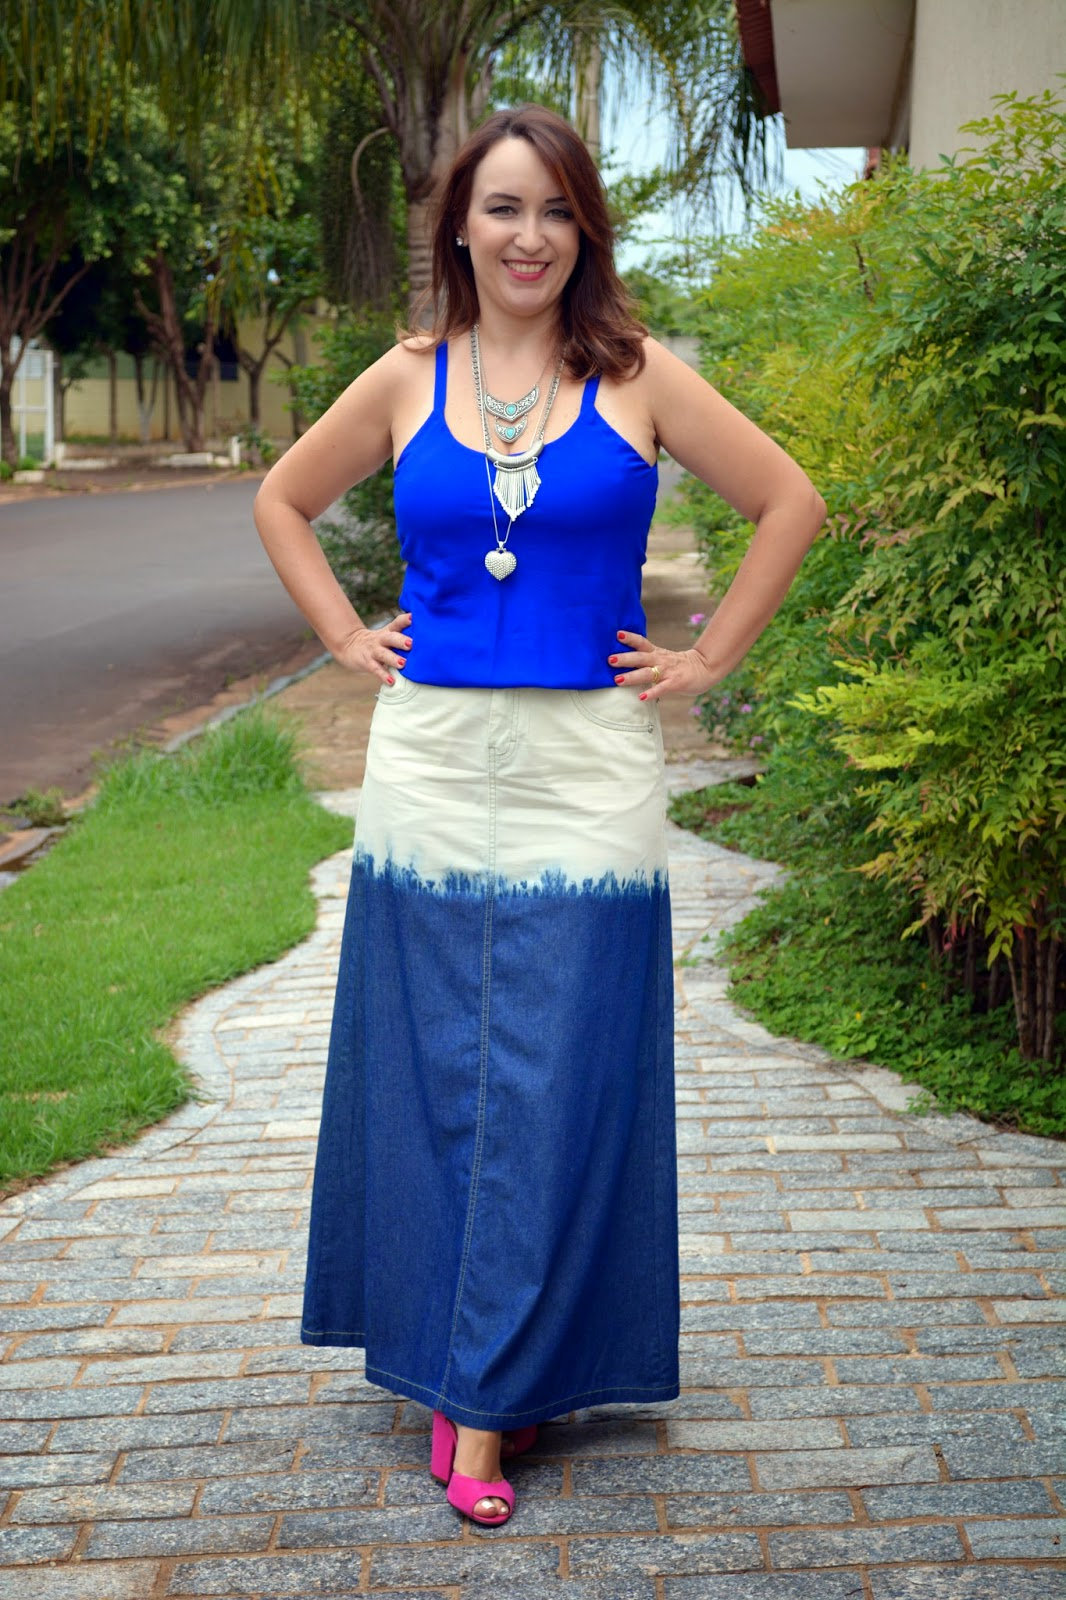 Blog Camila Andrade Se A Cor Vestido é Branco E Dourado Ou